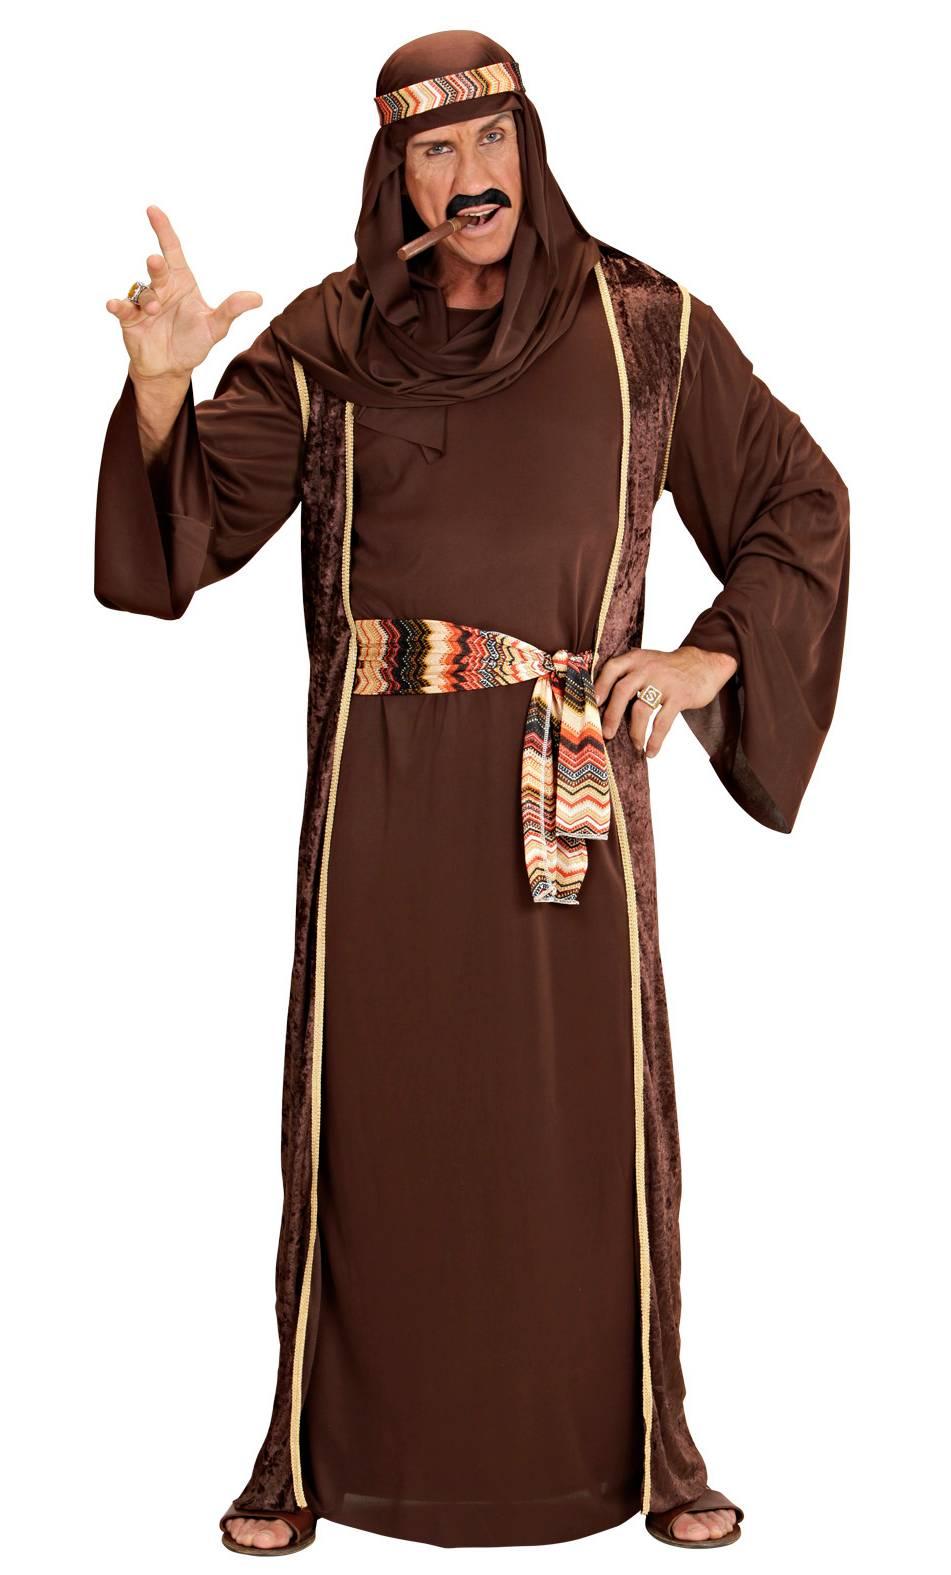 Costume sheik marron homme xl - xxl